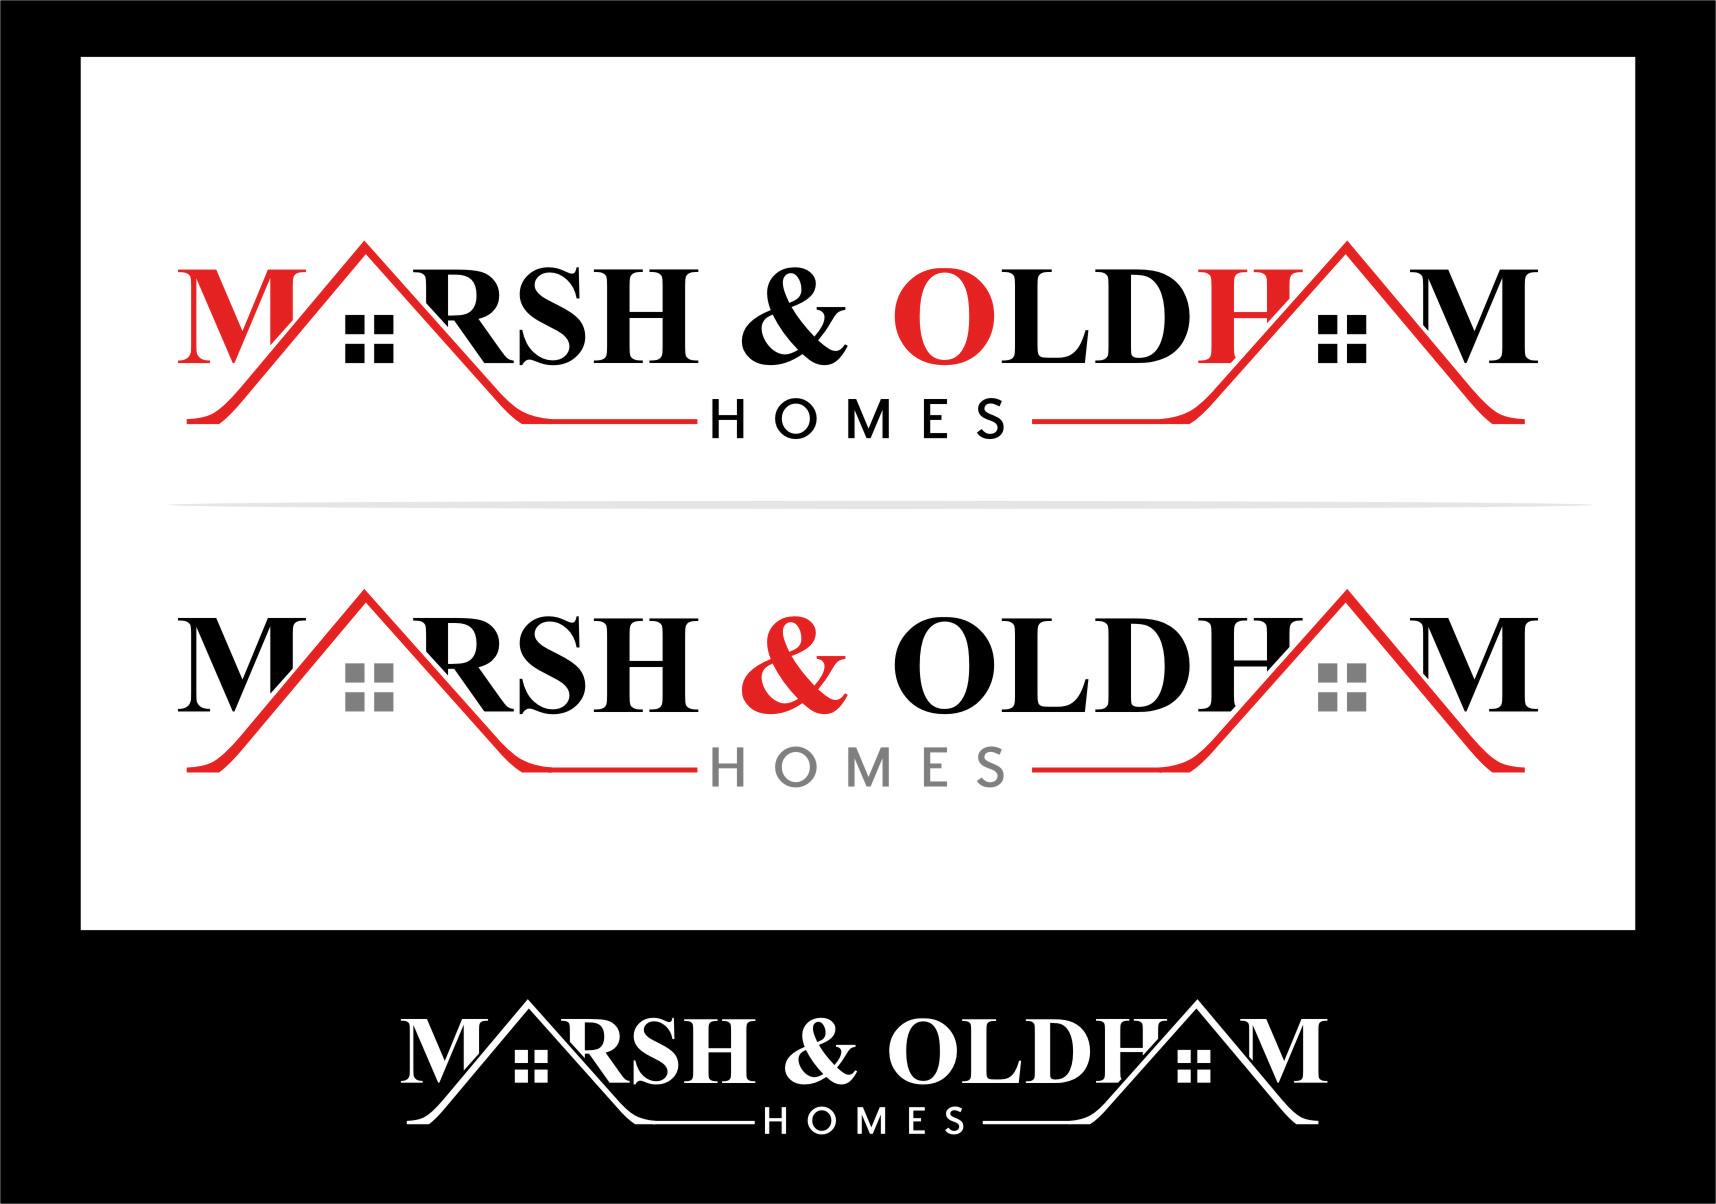 Logo Design by Ngepet_art - Entry No. 94 in the Logo Design Contest Artistic Logo Design for Marsh & Oldham Homes.